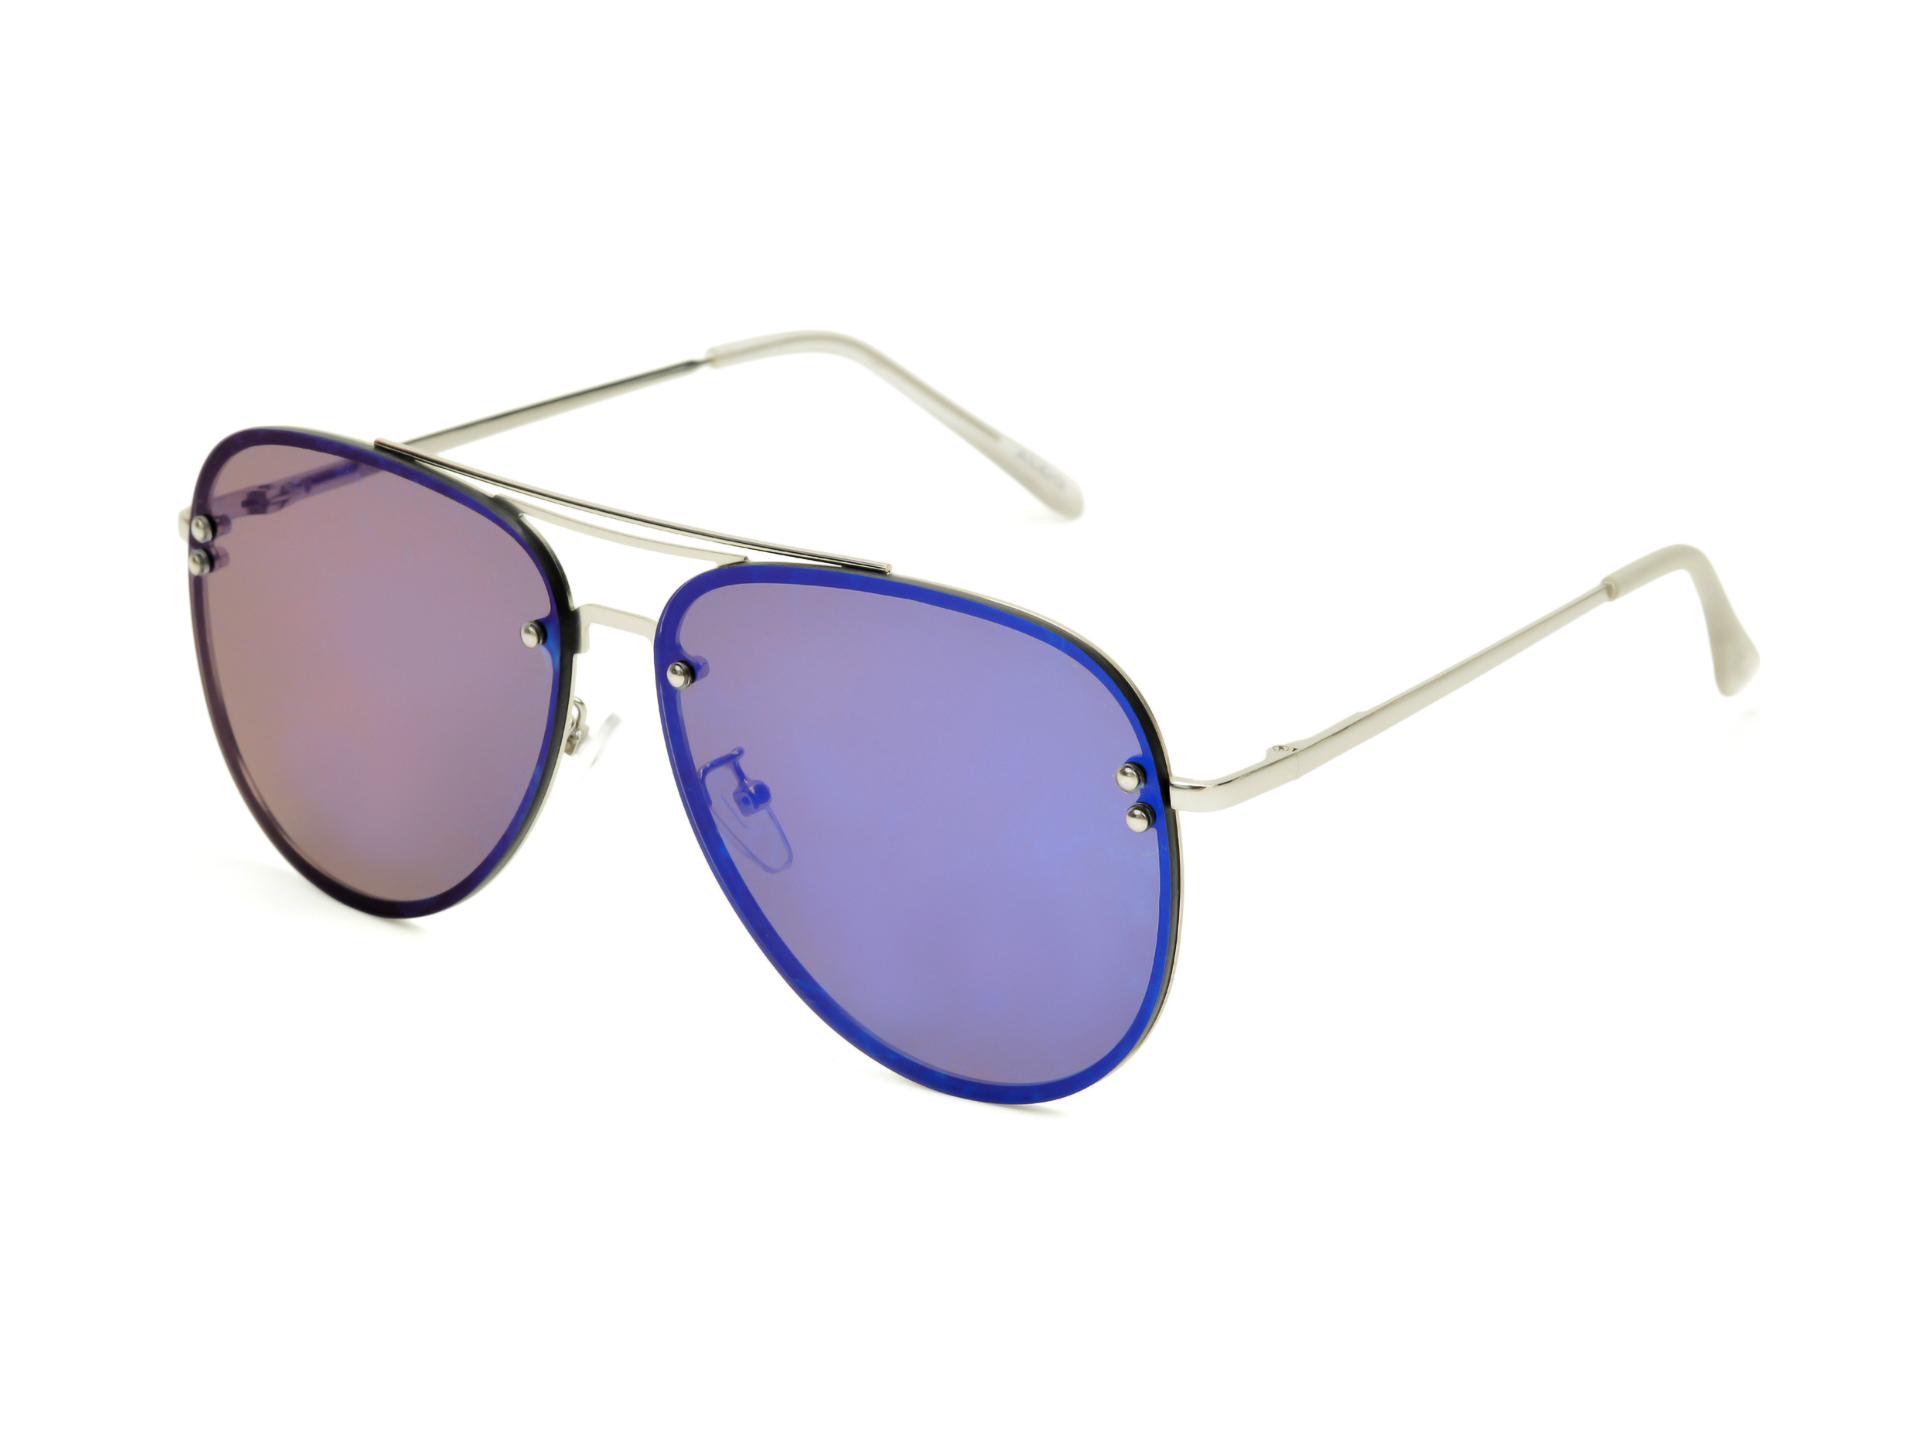 Ochelari de soare ALDO argintii, Horeven040, din PVC imagine otter.ro